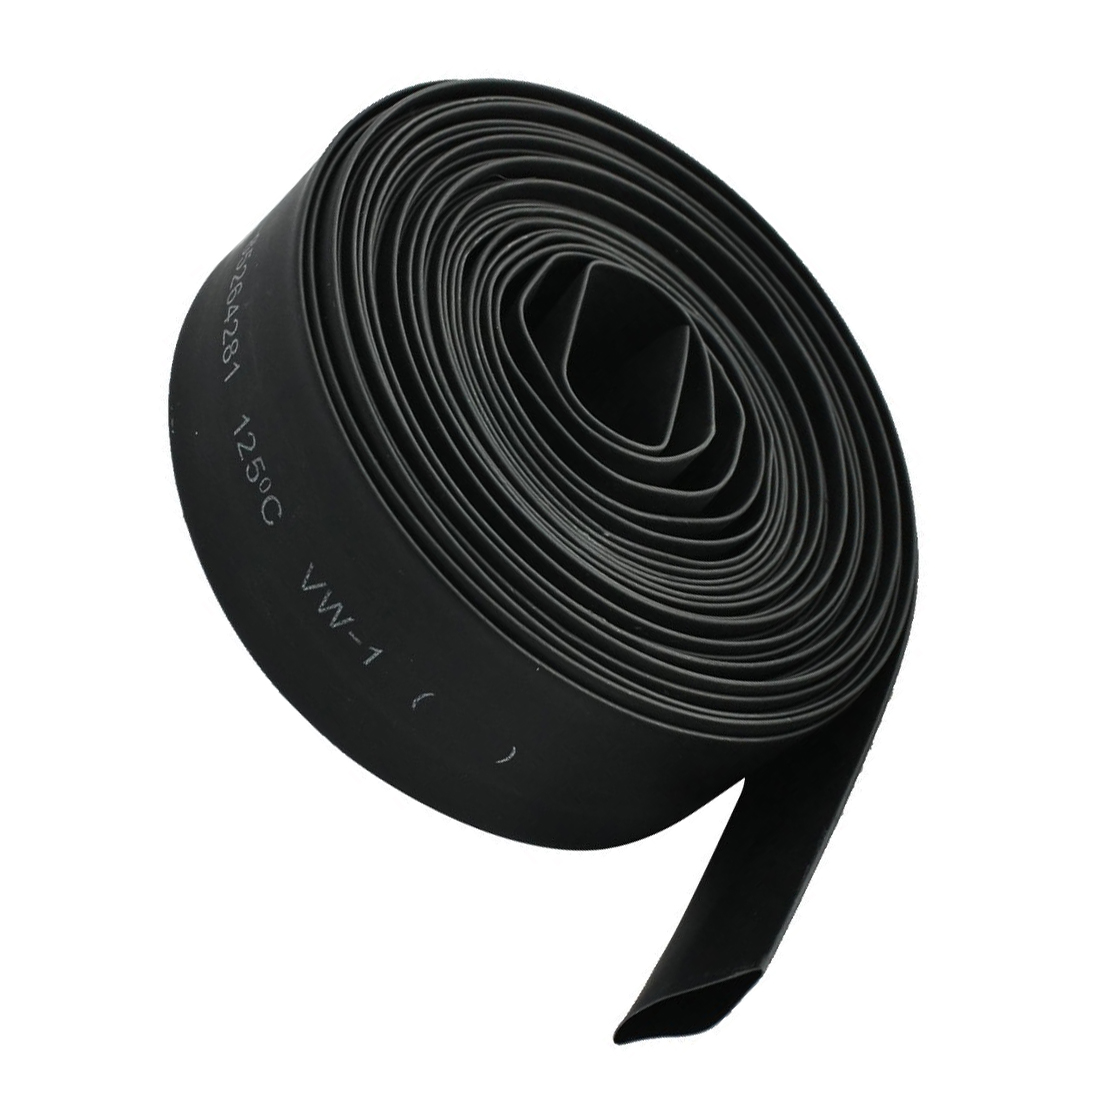 KSOL 2mm/6M 15mm/5M 30mm/1M 70mm/1M 8mm/5M 5mm/6M 12mm/10M 2:1 Black Polyolefin Insulation Heat Shrink Tubing цены